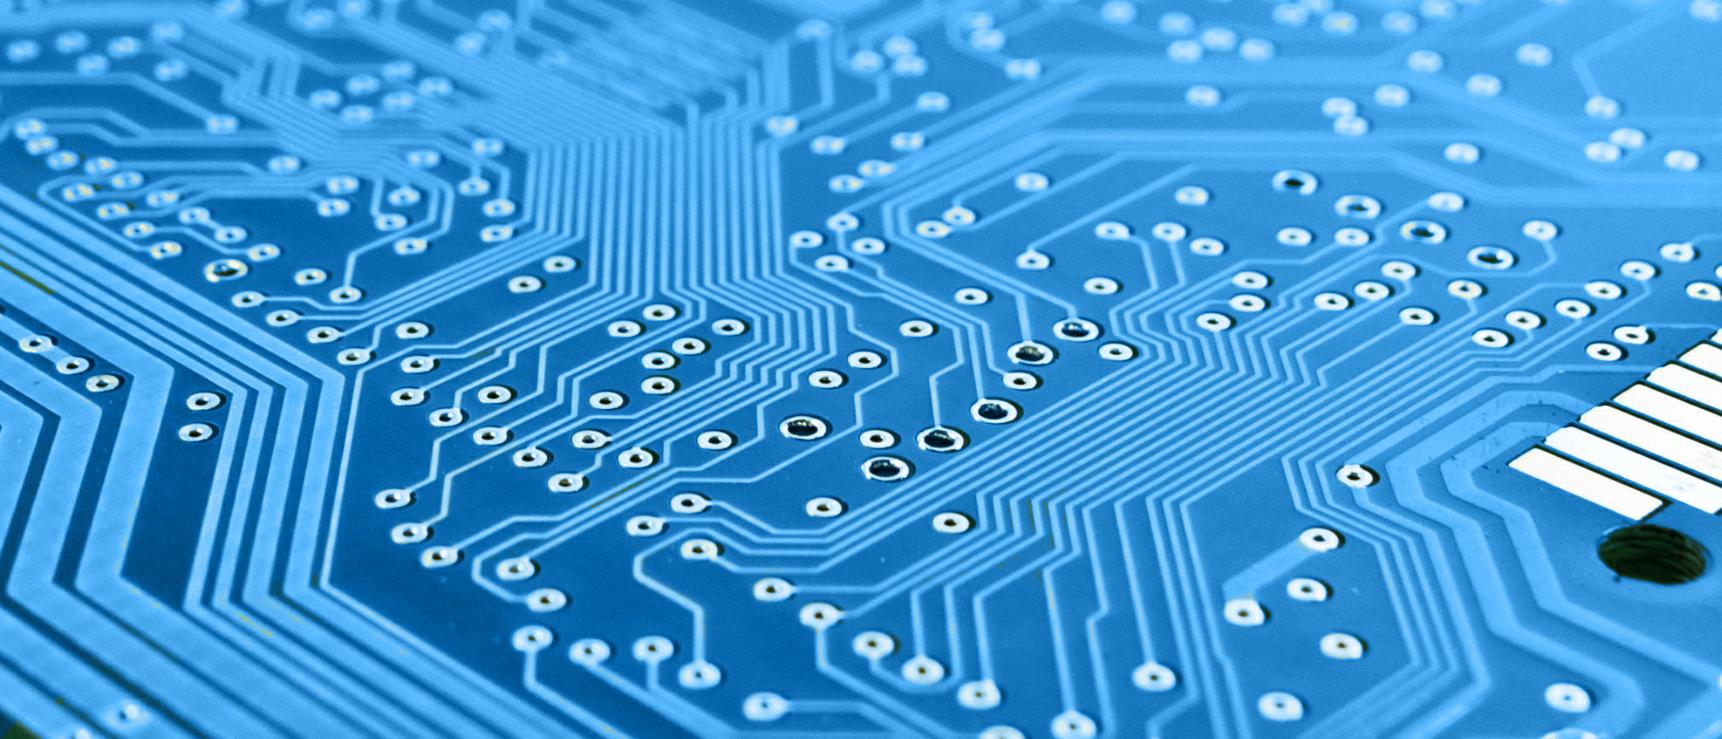 Arbin blue circuit background   Arbin Instruments 1722x739